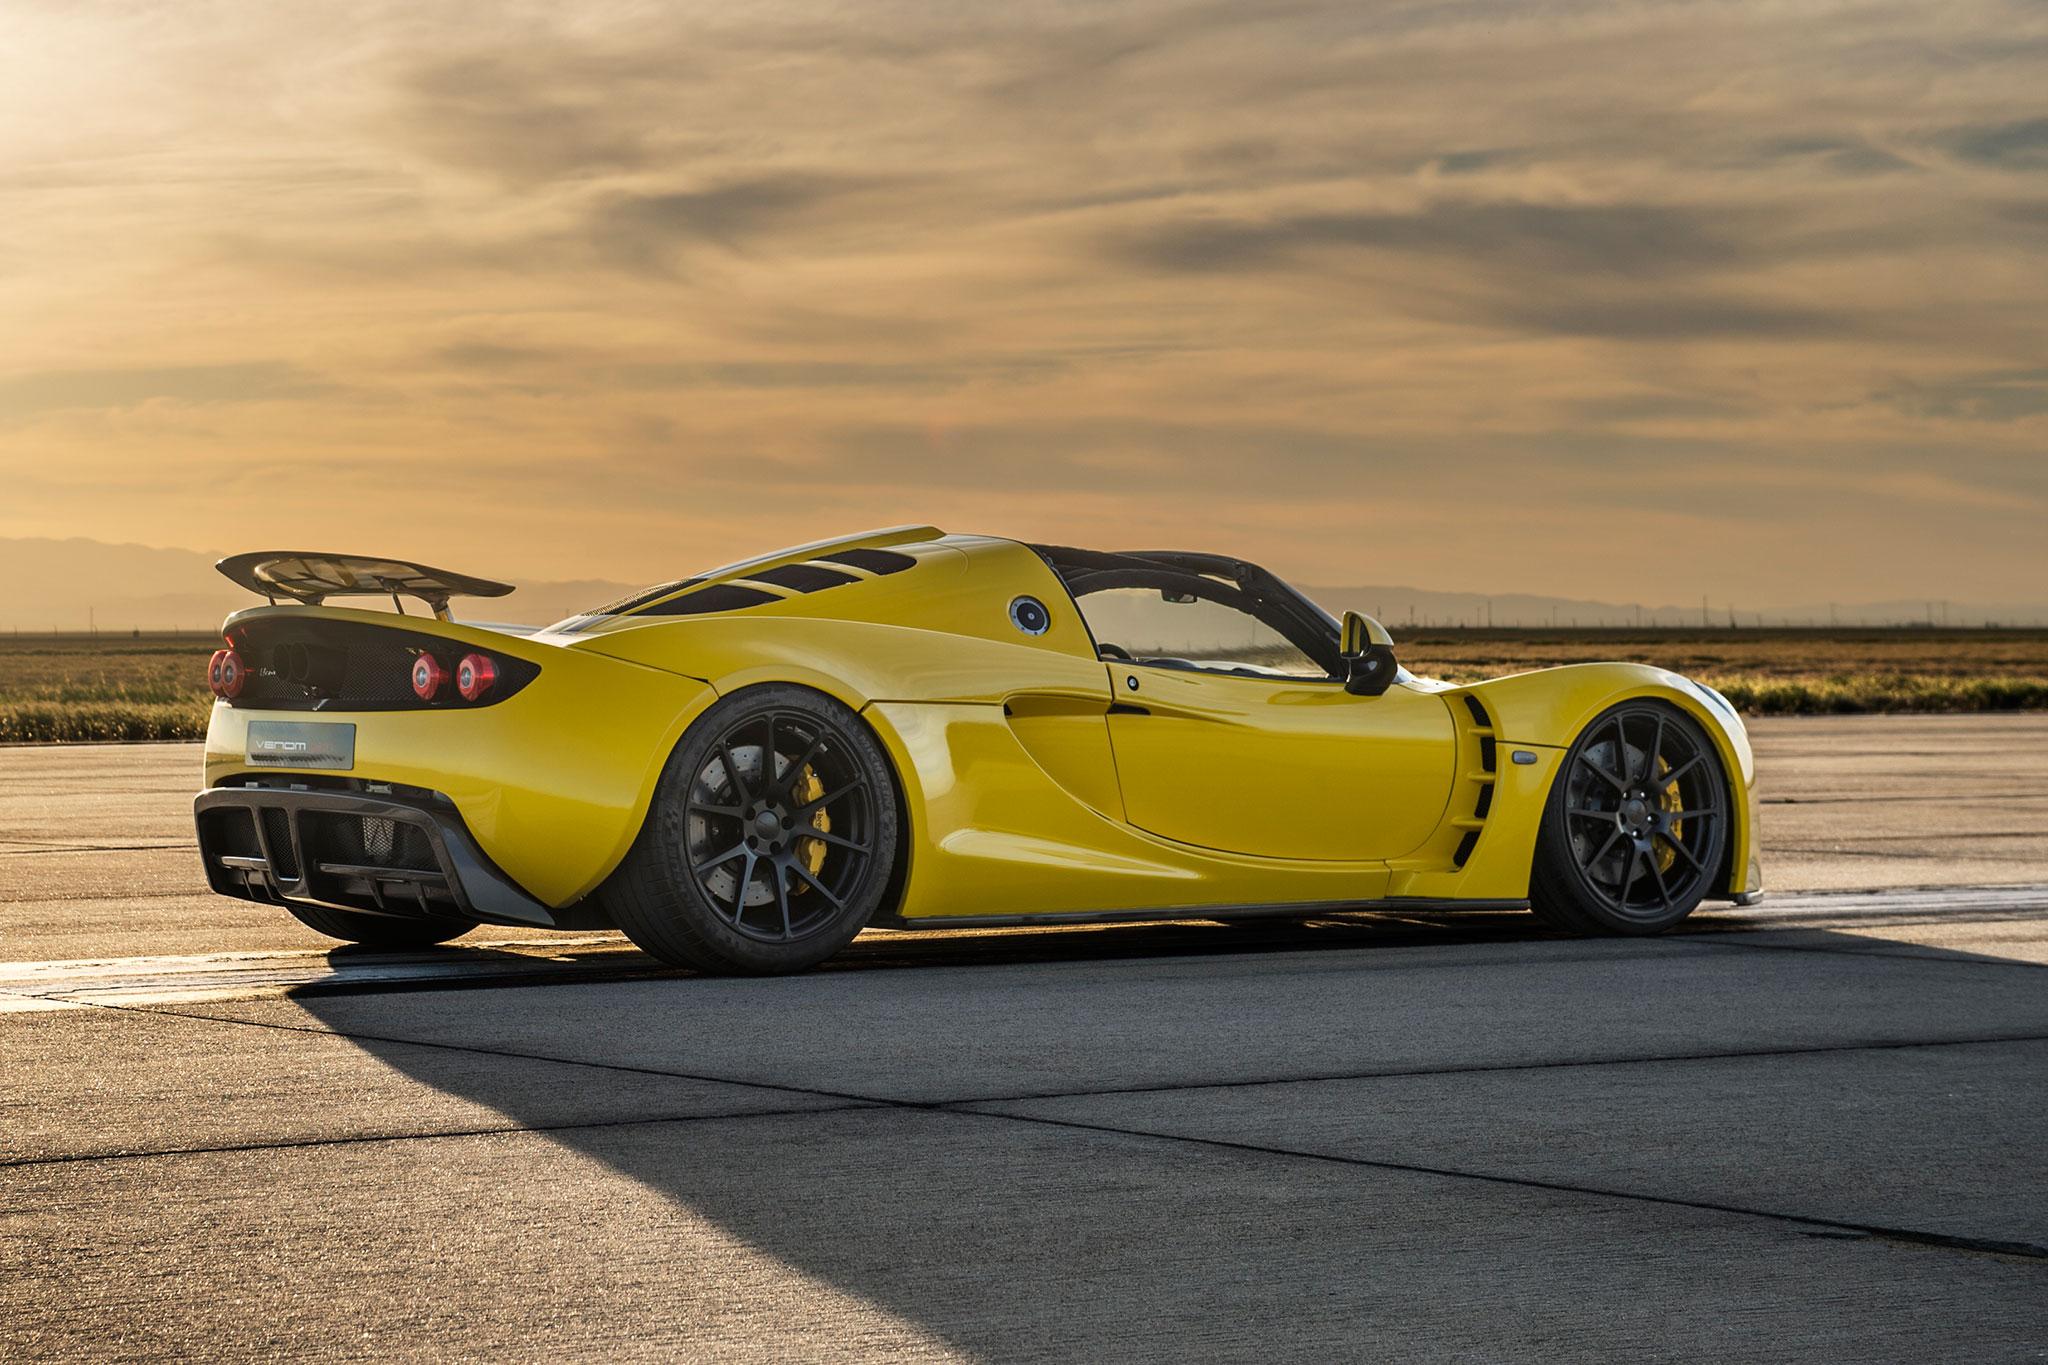 Hennessey Venom GT Spyder Sets New Top Speed Record